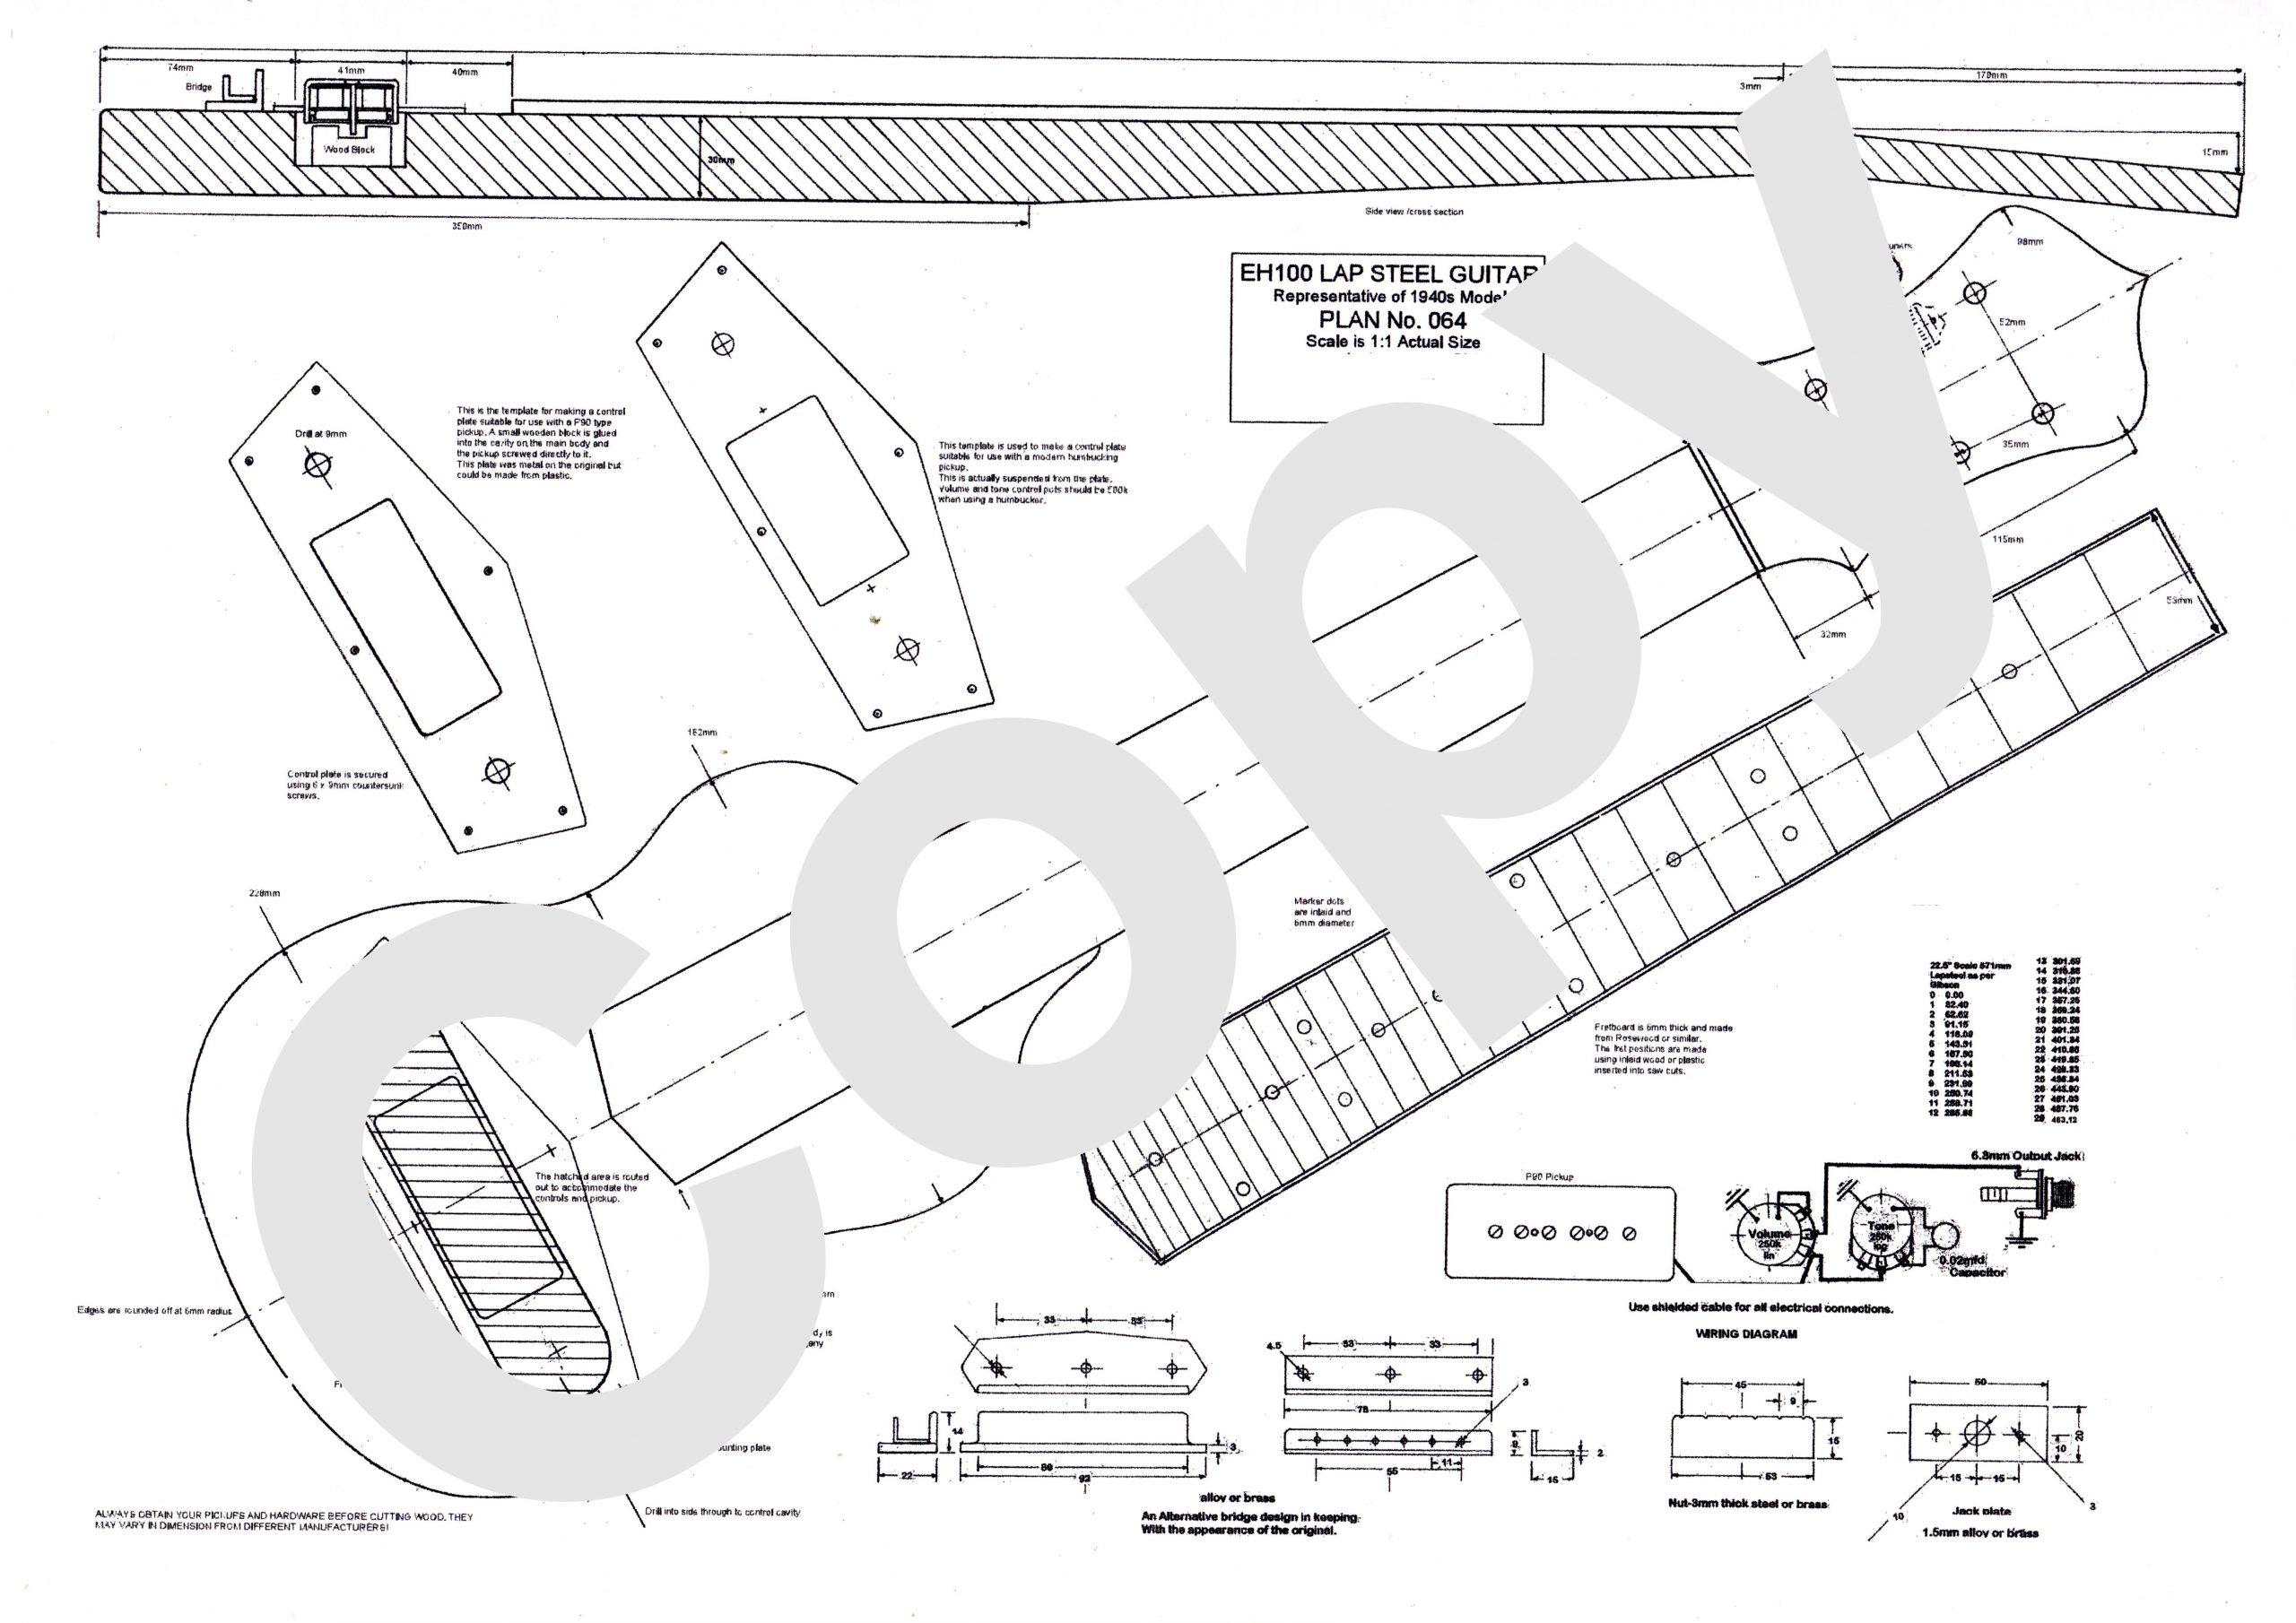 lap steel guitar wiring diagram plans to build eh100 electric lapsteel guitar  build eh100 electric lapsteel guitar